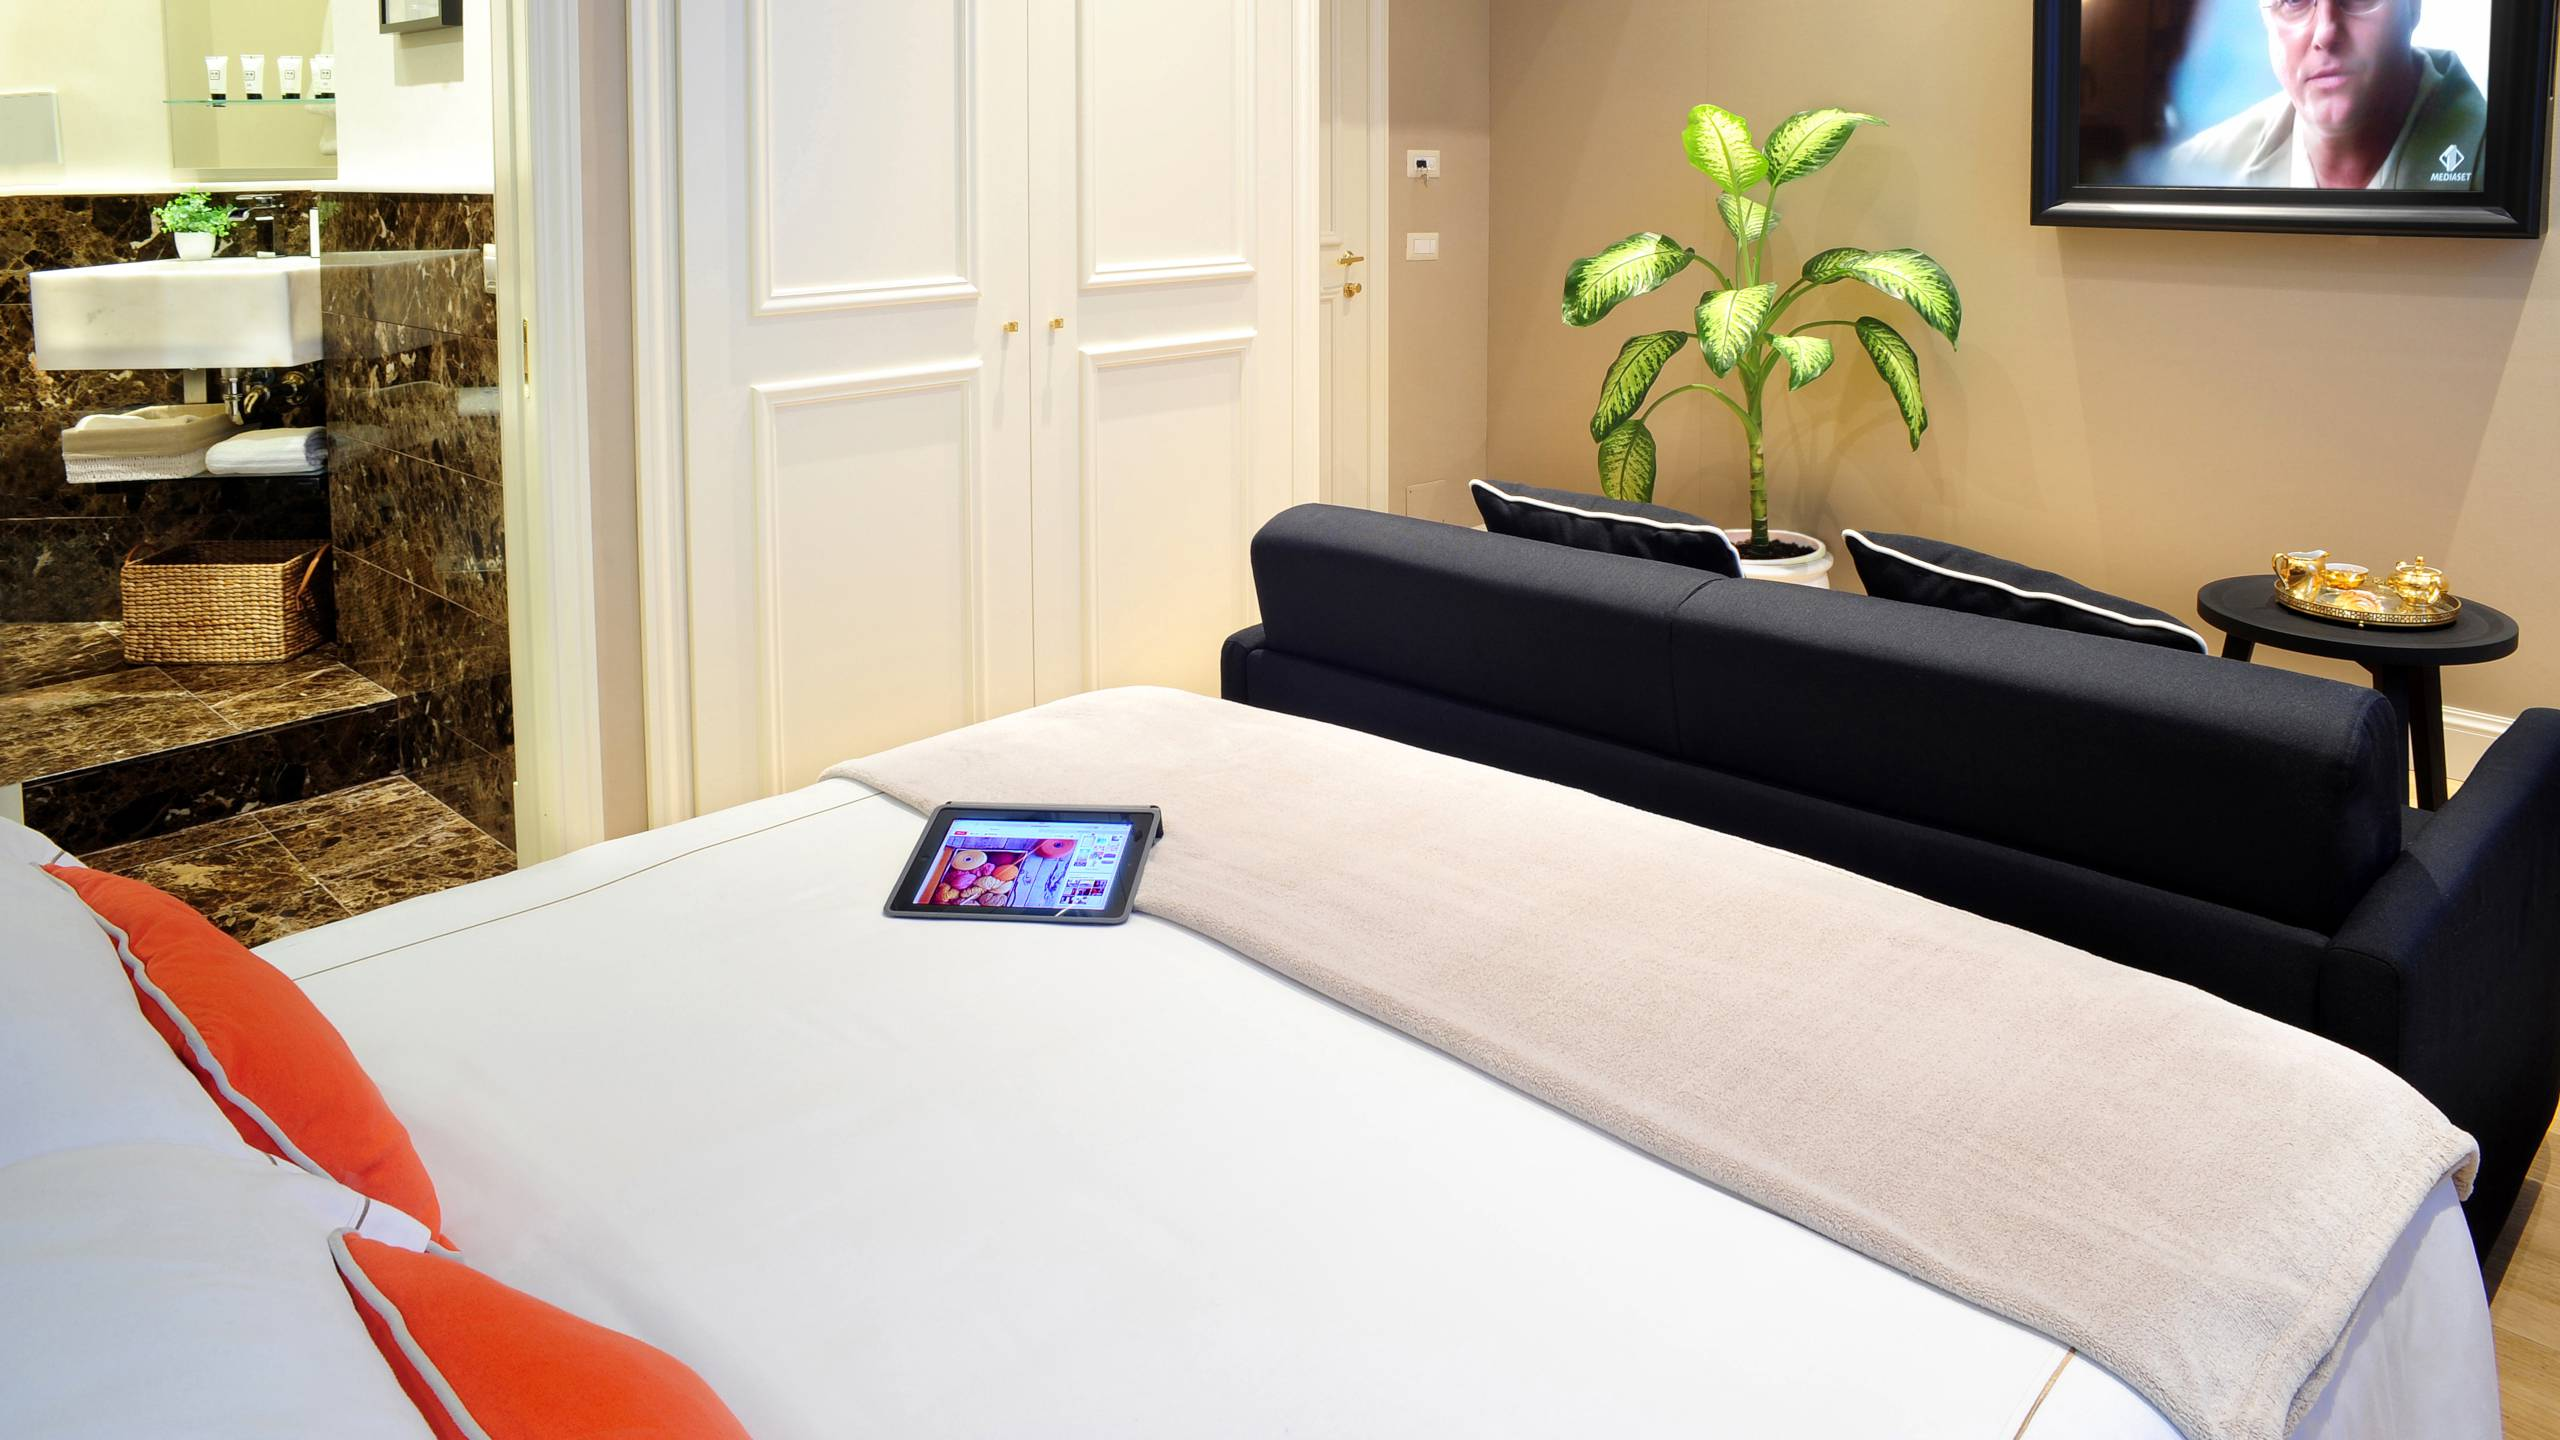 Nerva-Boutique-Hotel-bedroom-15